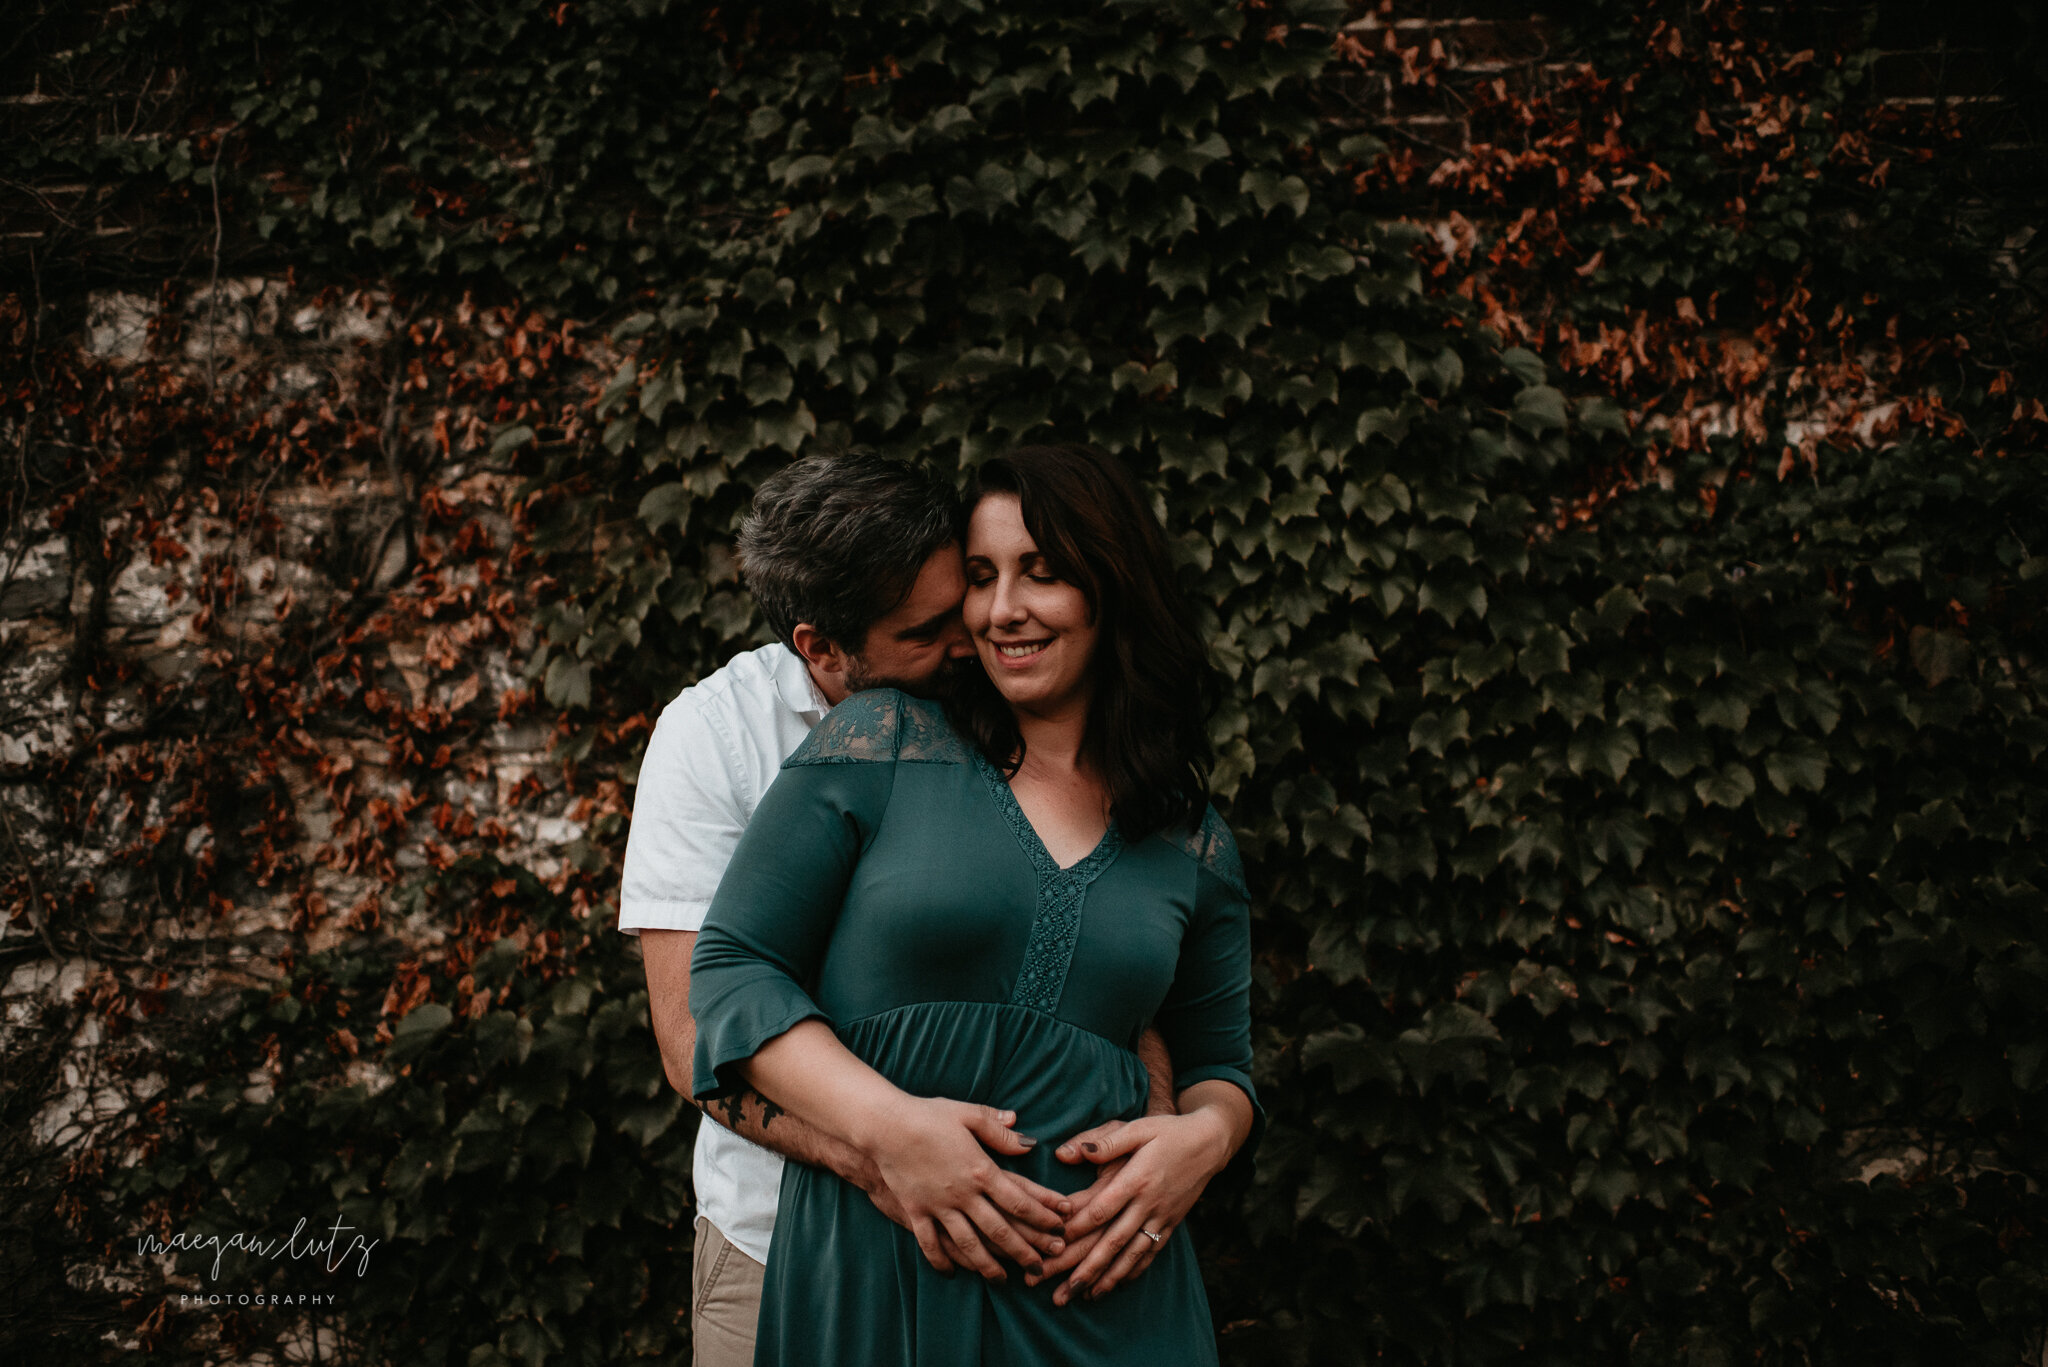 NEPA-Lehigh-Valley-Wedding-Engagement-photographer-at-the-rose-garden-allentown-PA-39.jpg